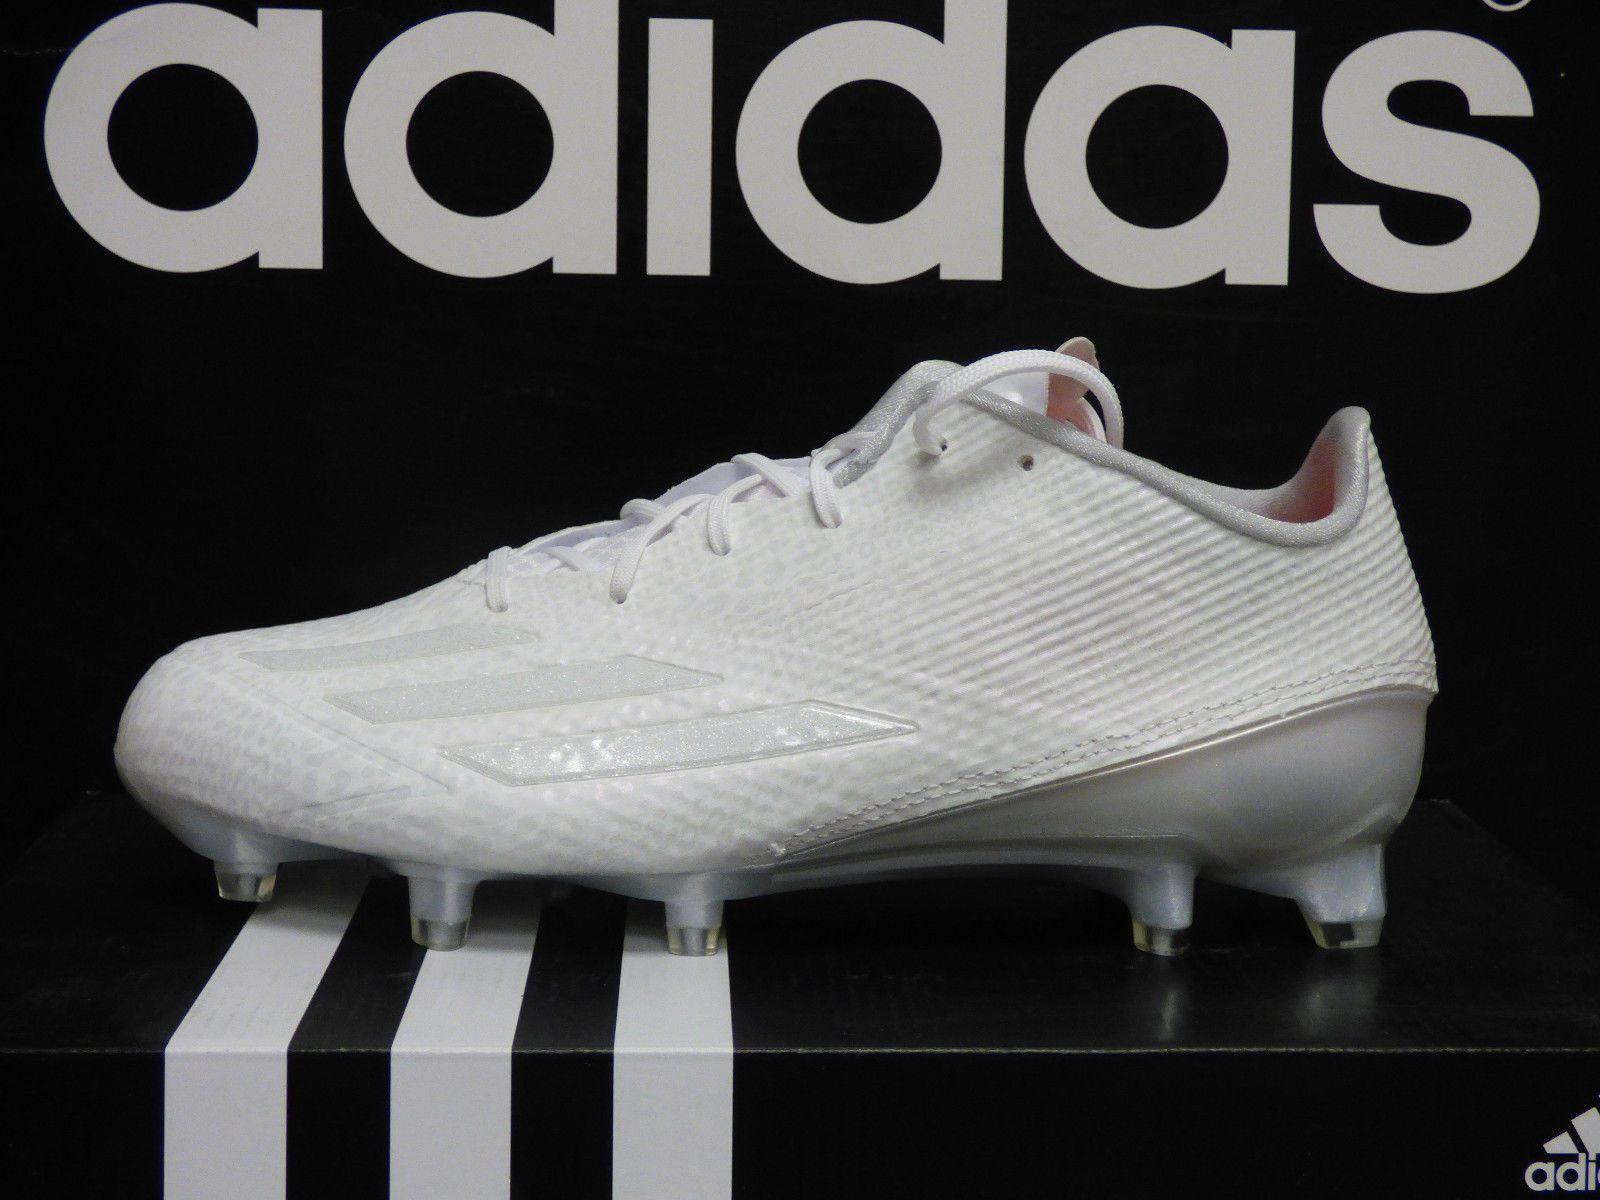 cf4454c1b13 NEW ADIDAS Adizero 5-Star 5.0 Mens Football Cleats White White  Q16063